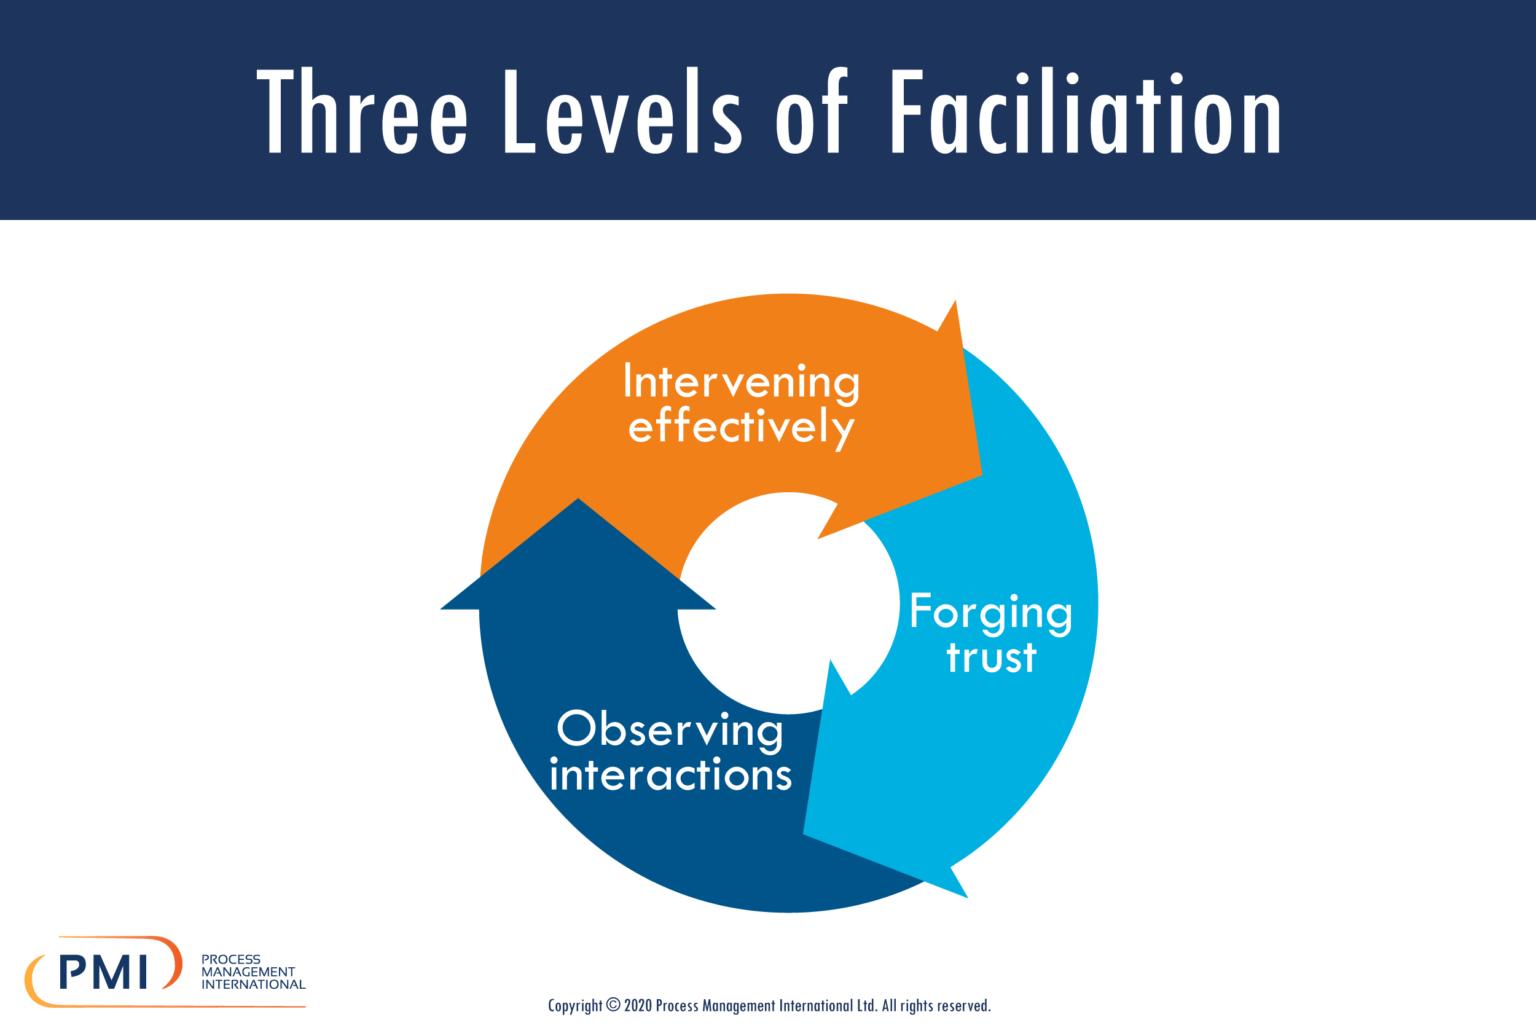 Three Levels of Facilitation Infographic